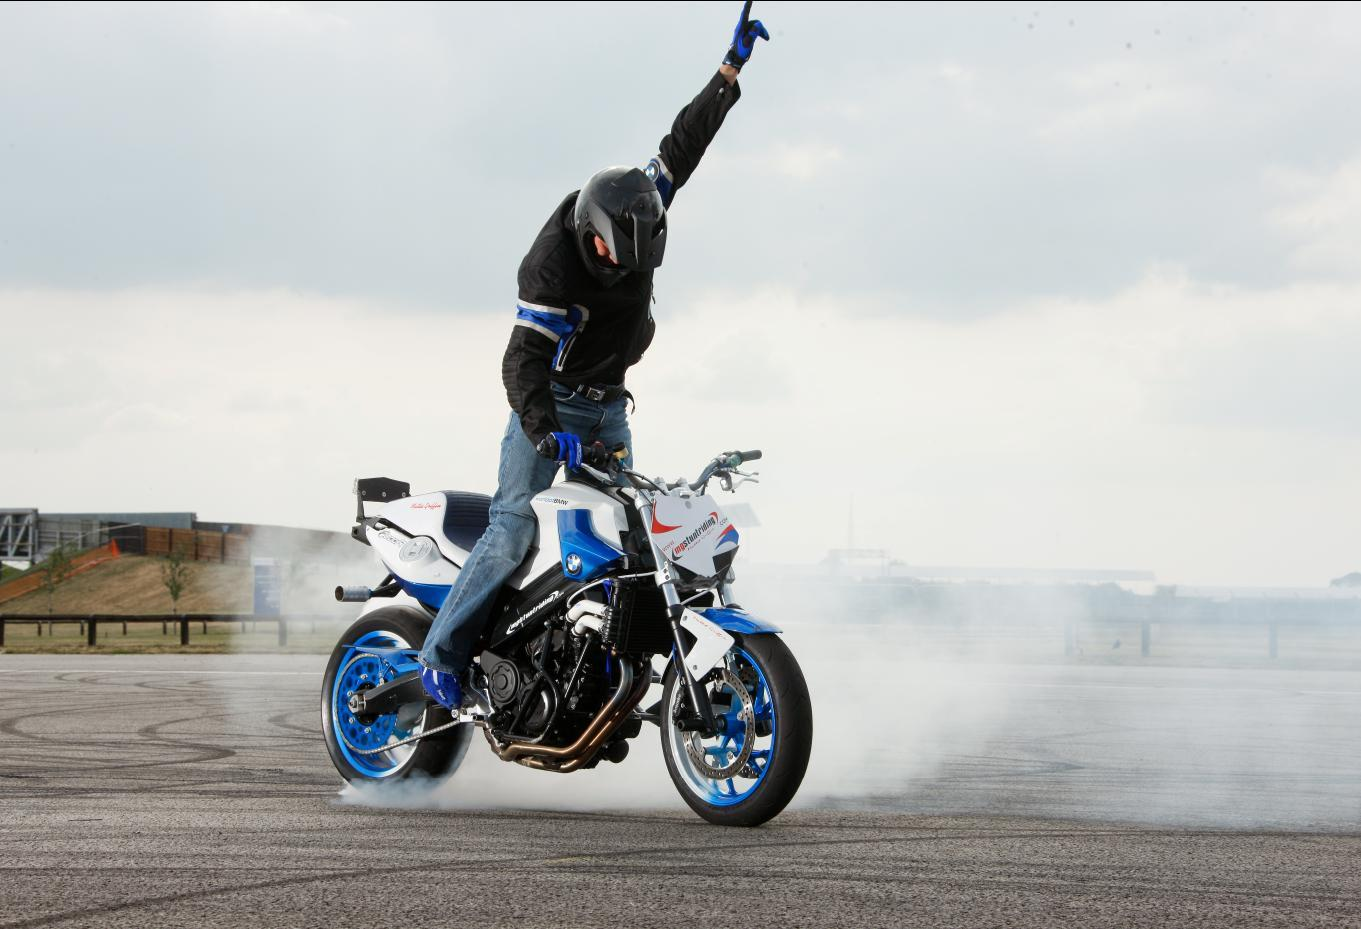 Image Gallery Motorcycle Stunts